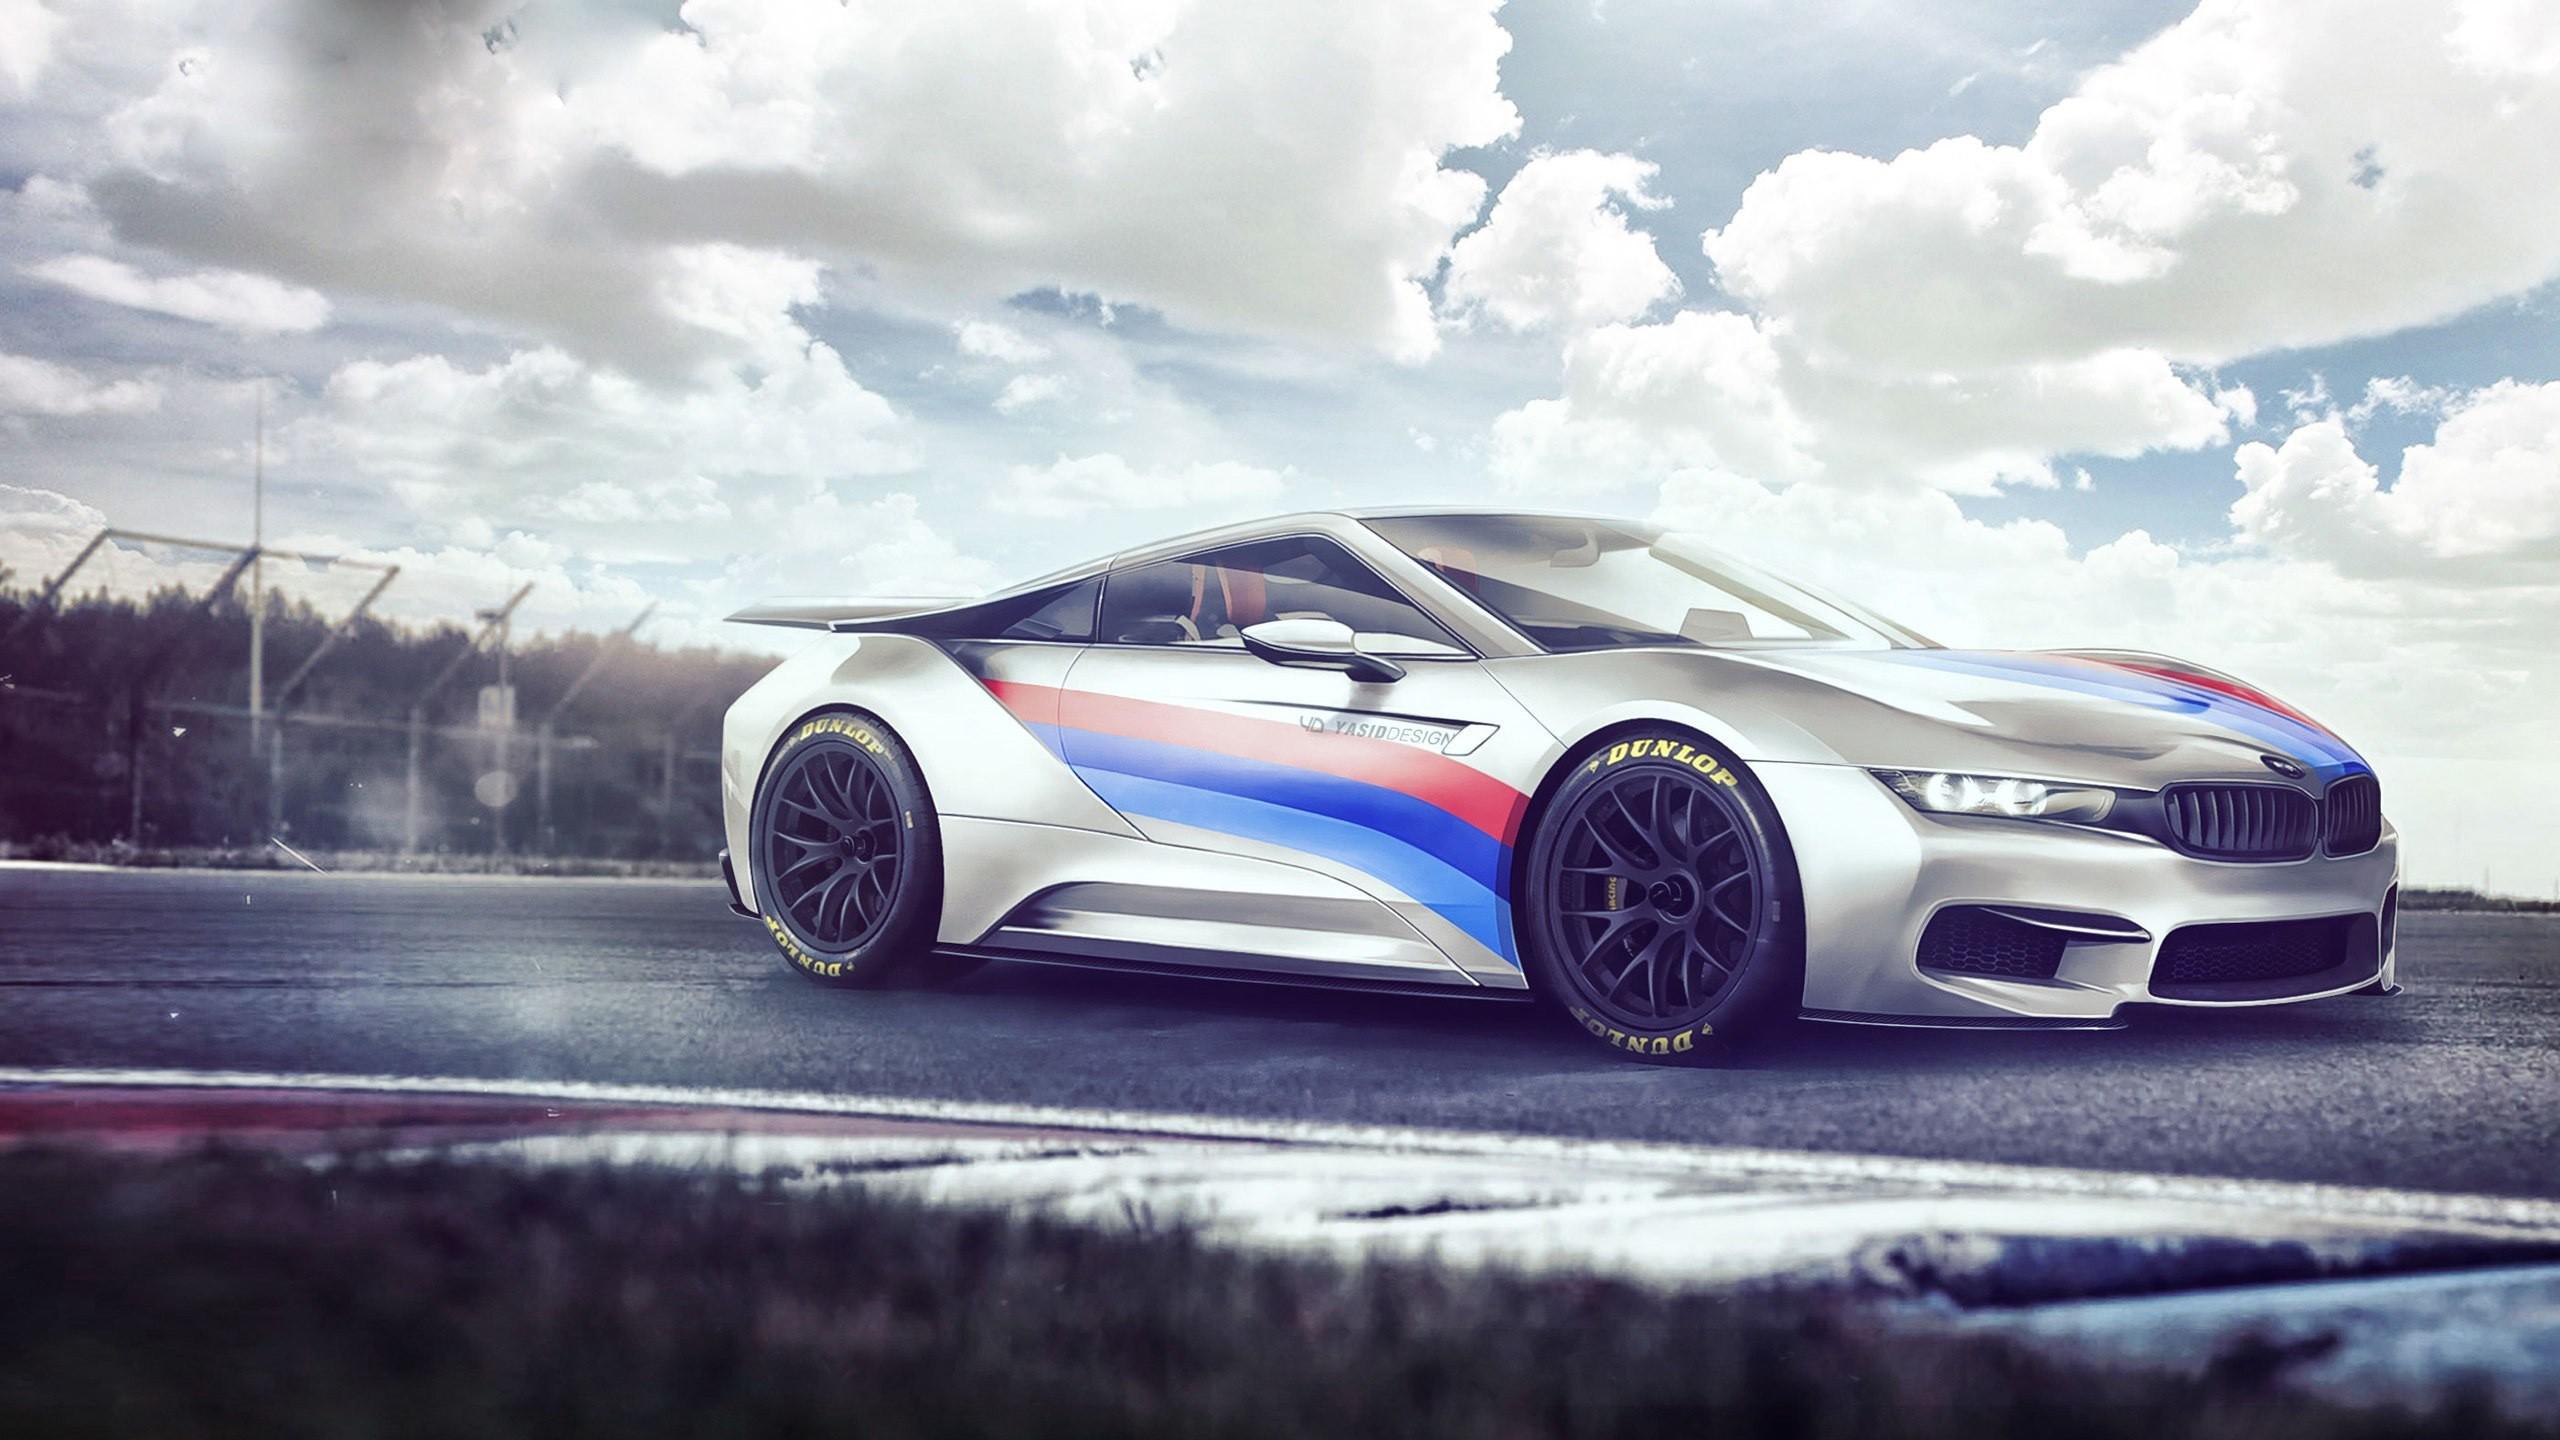 Bmw I8 Car Concept 4k Hd Desktop Wallpaper For 4k Ultra Hd: BMW I8 Concept Electro Wallpaper